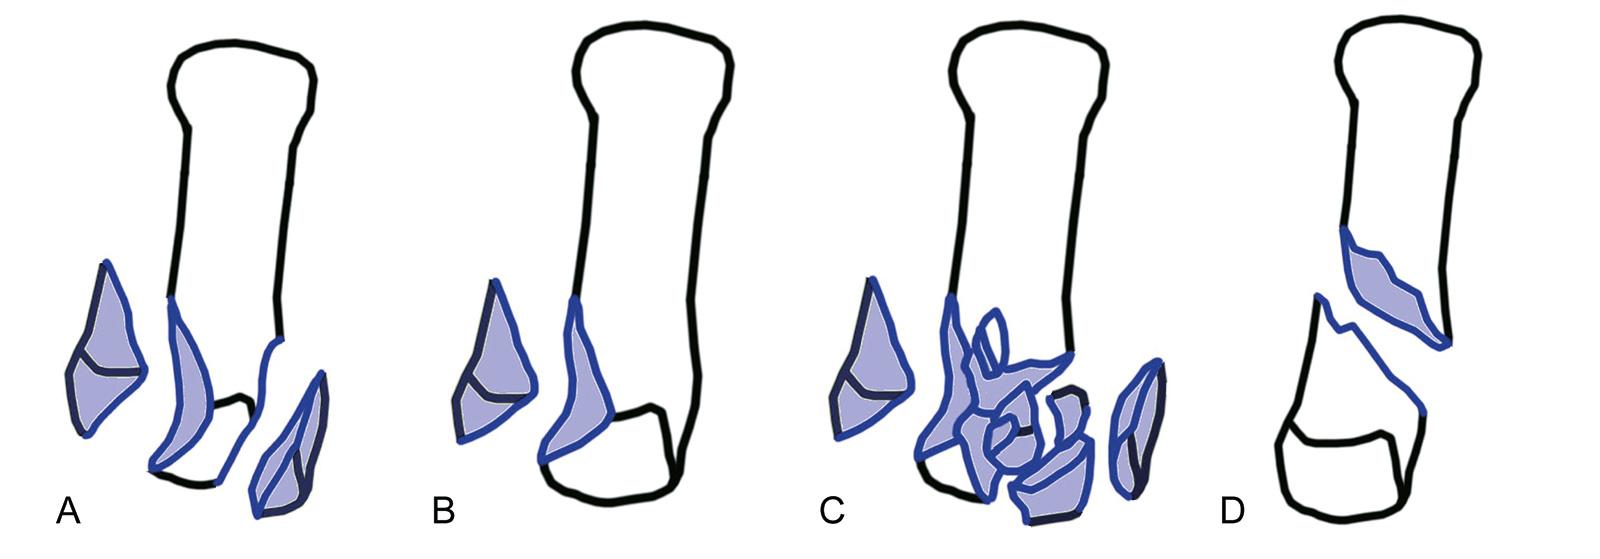 Abb. 7-8: Frakturen des Metacarpale 1: Rolando-Fraktur (A), Bennett-Fraktur (B), Trümmerfraktur (C) und Winterstein-Fraktur (D)